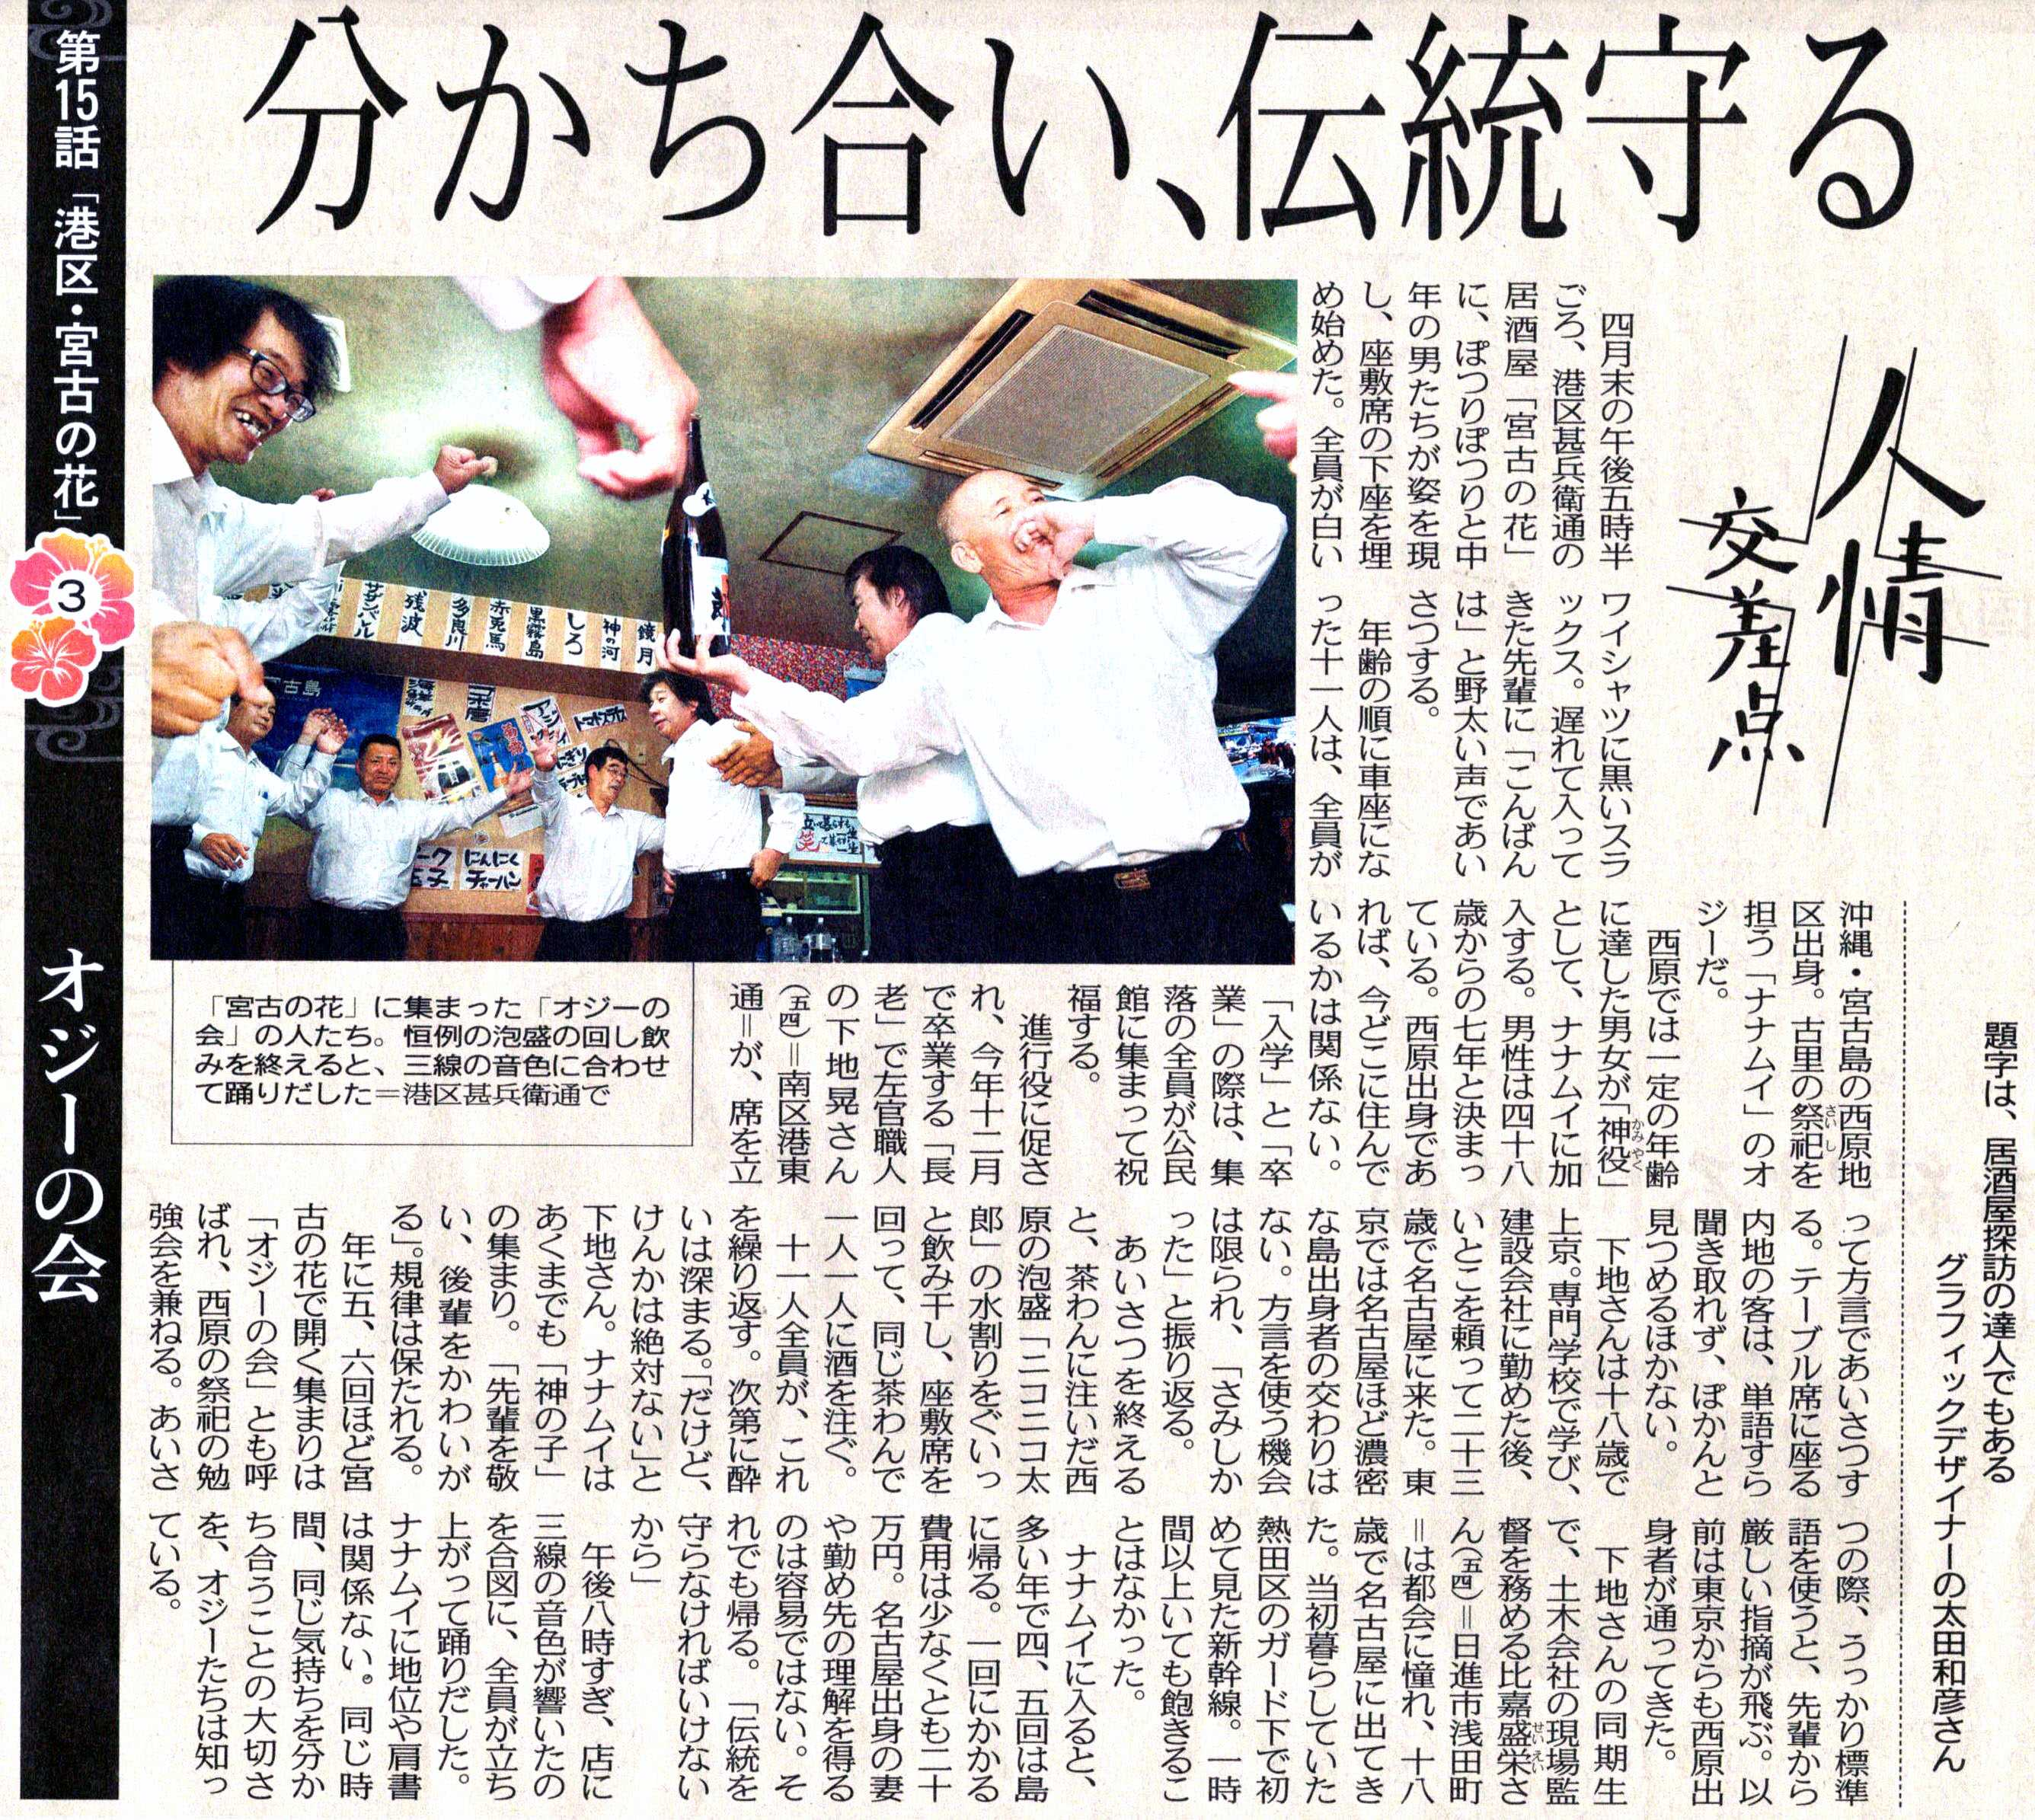 https://img.atwikiimg.com/www45.atwiki.jp/jippensha/attach/72/5333/12_03.jpg